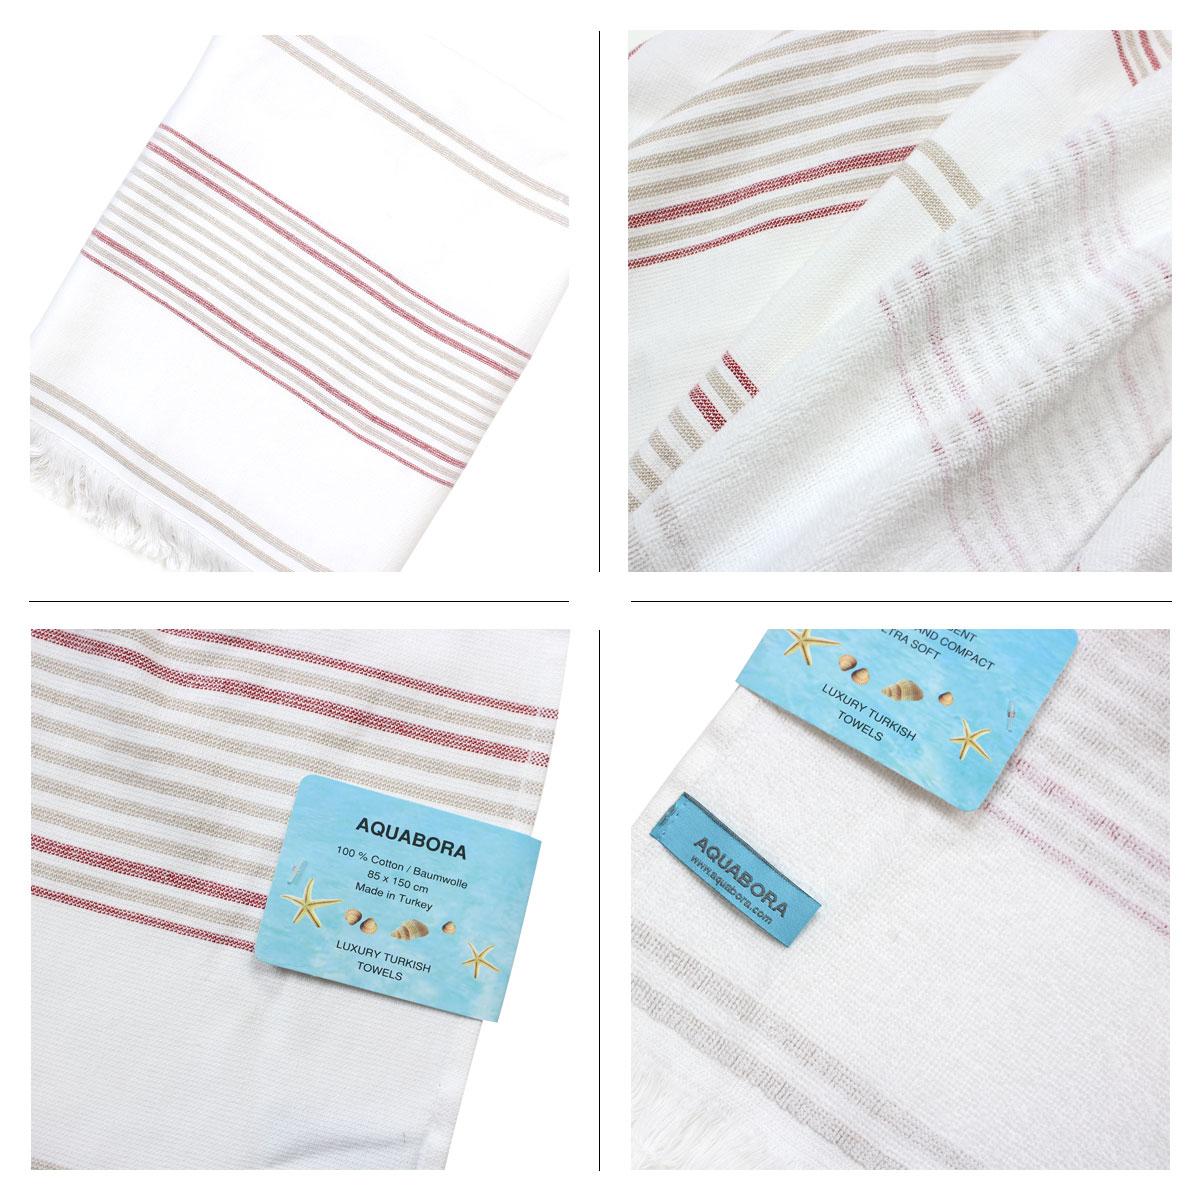 aqua bora acabara towels turkish towels beach towels towel trinidad - Turkish Towels